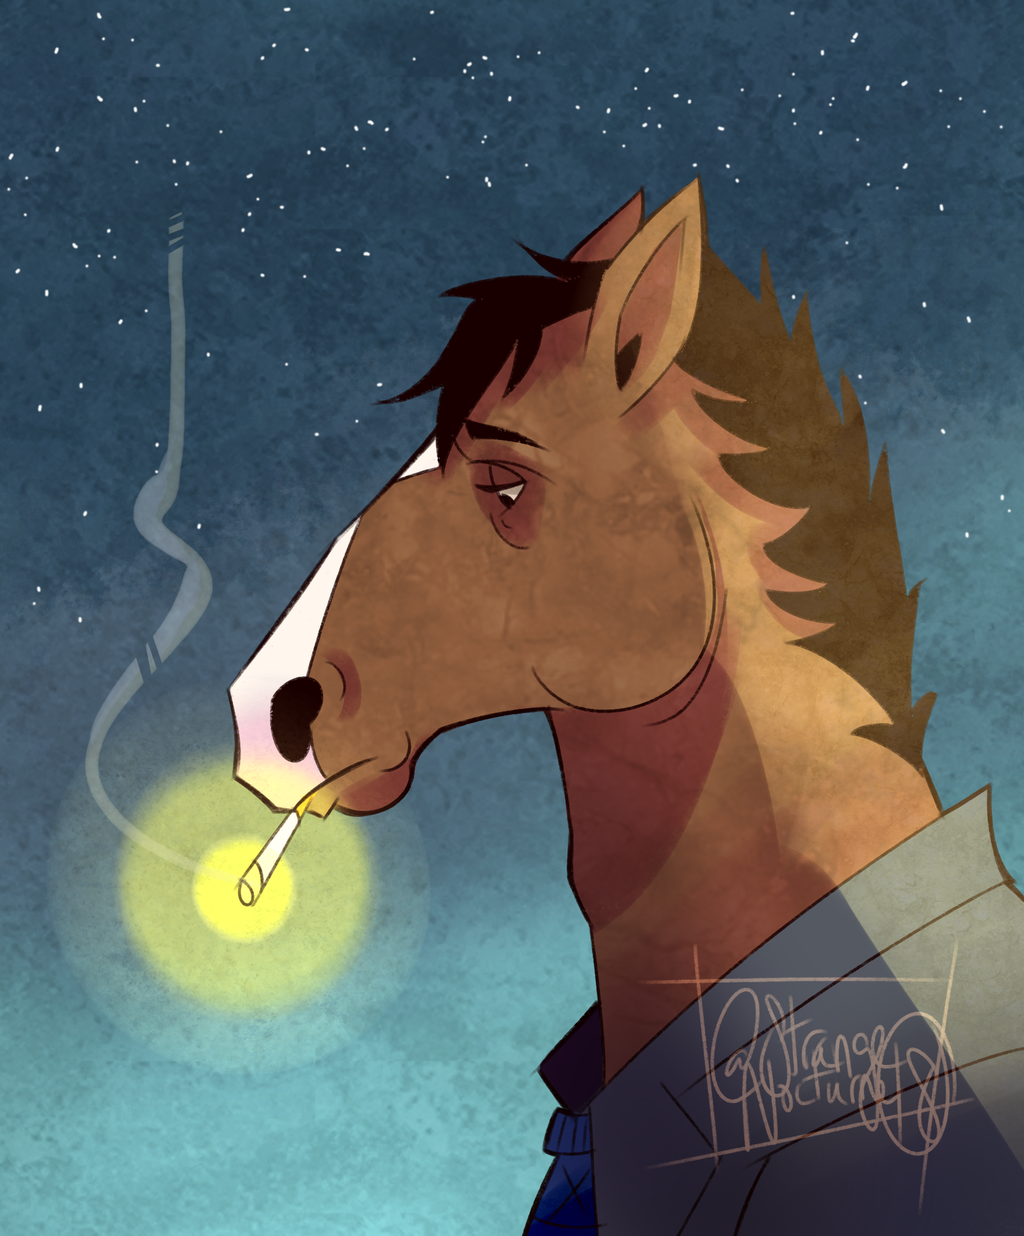 Bojack Horseman Bojack Horseman Horseman Animation